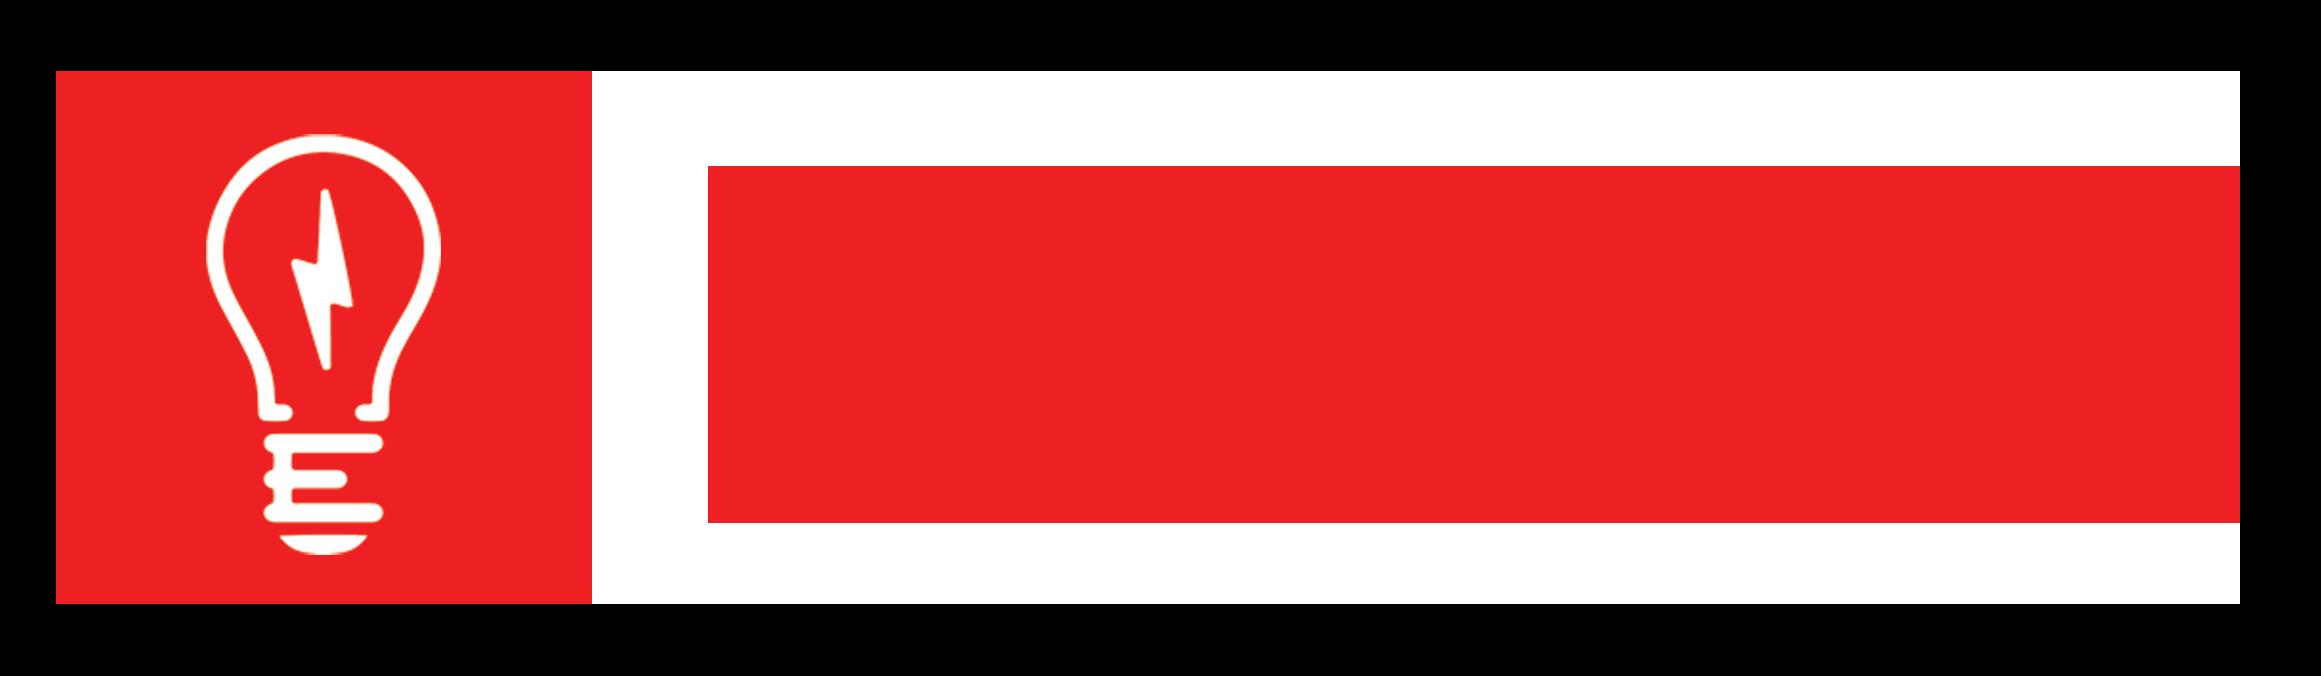 TrepCon